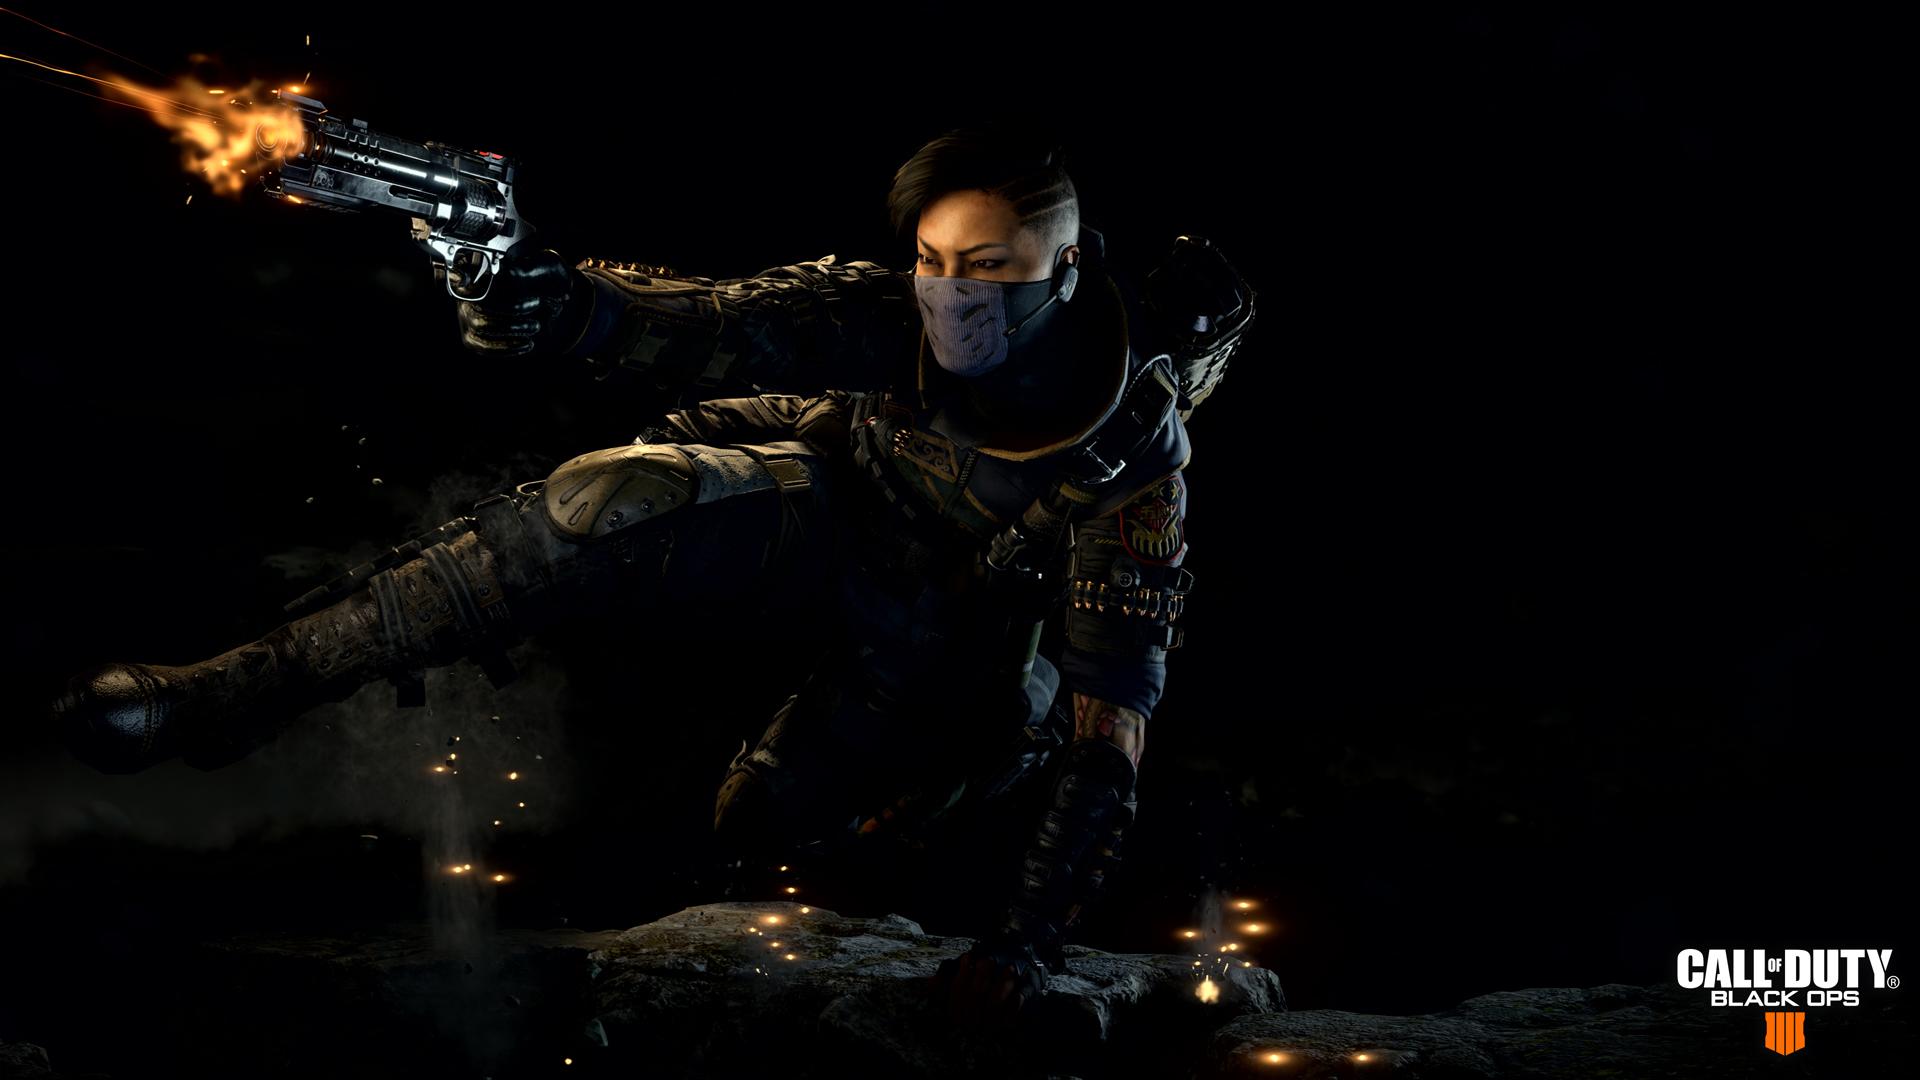 Call of Duty Black Ops 4 Screenshot #8. Bild: Activision